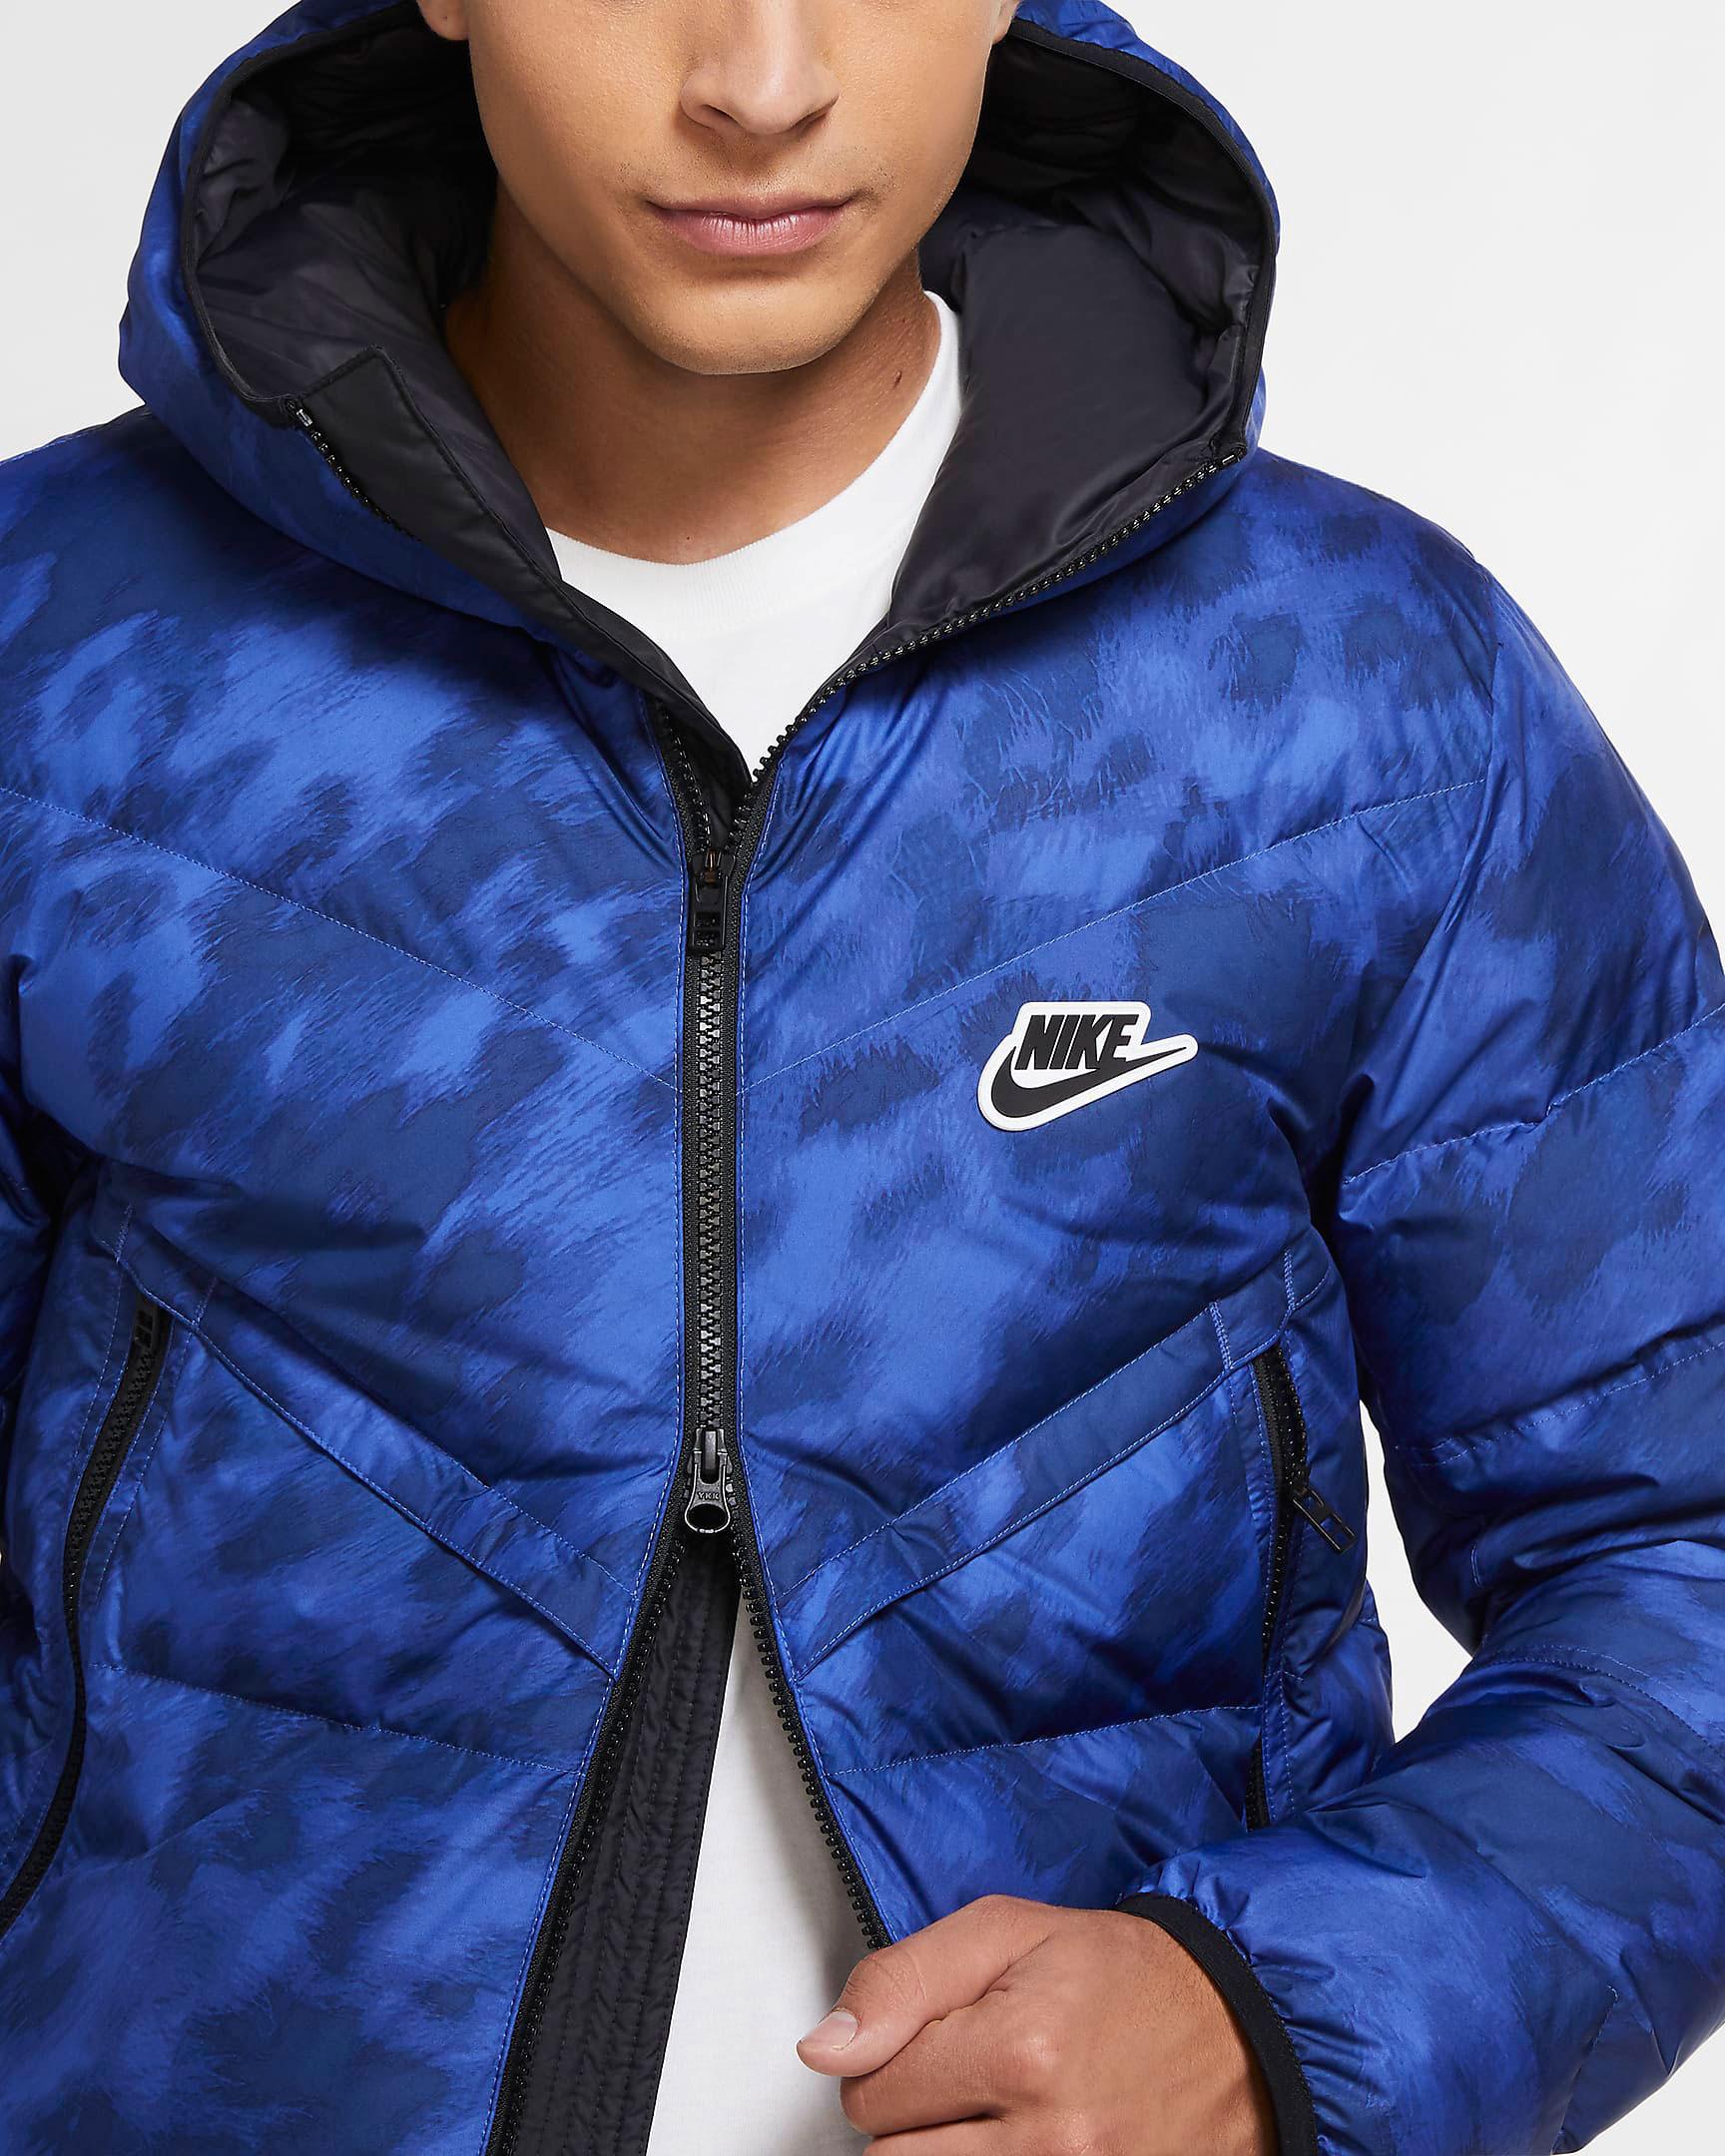 jordan-13-hyper-royal-black-nike-winter-jacket-3